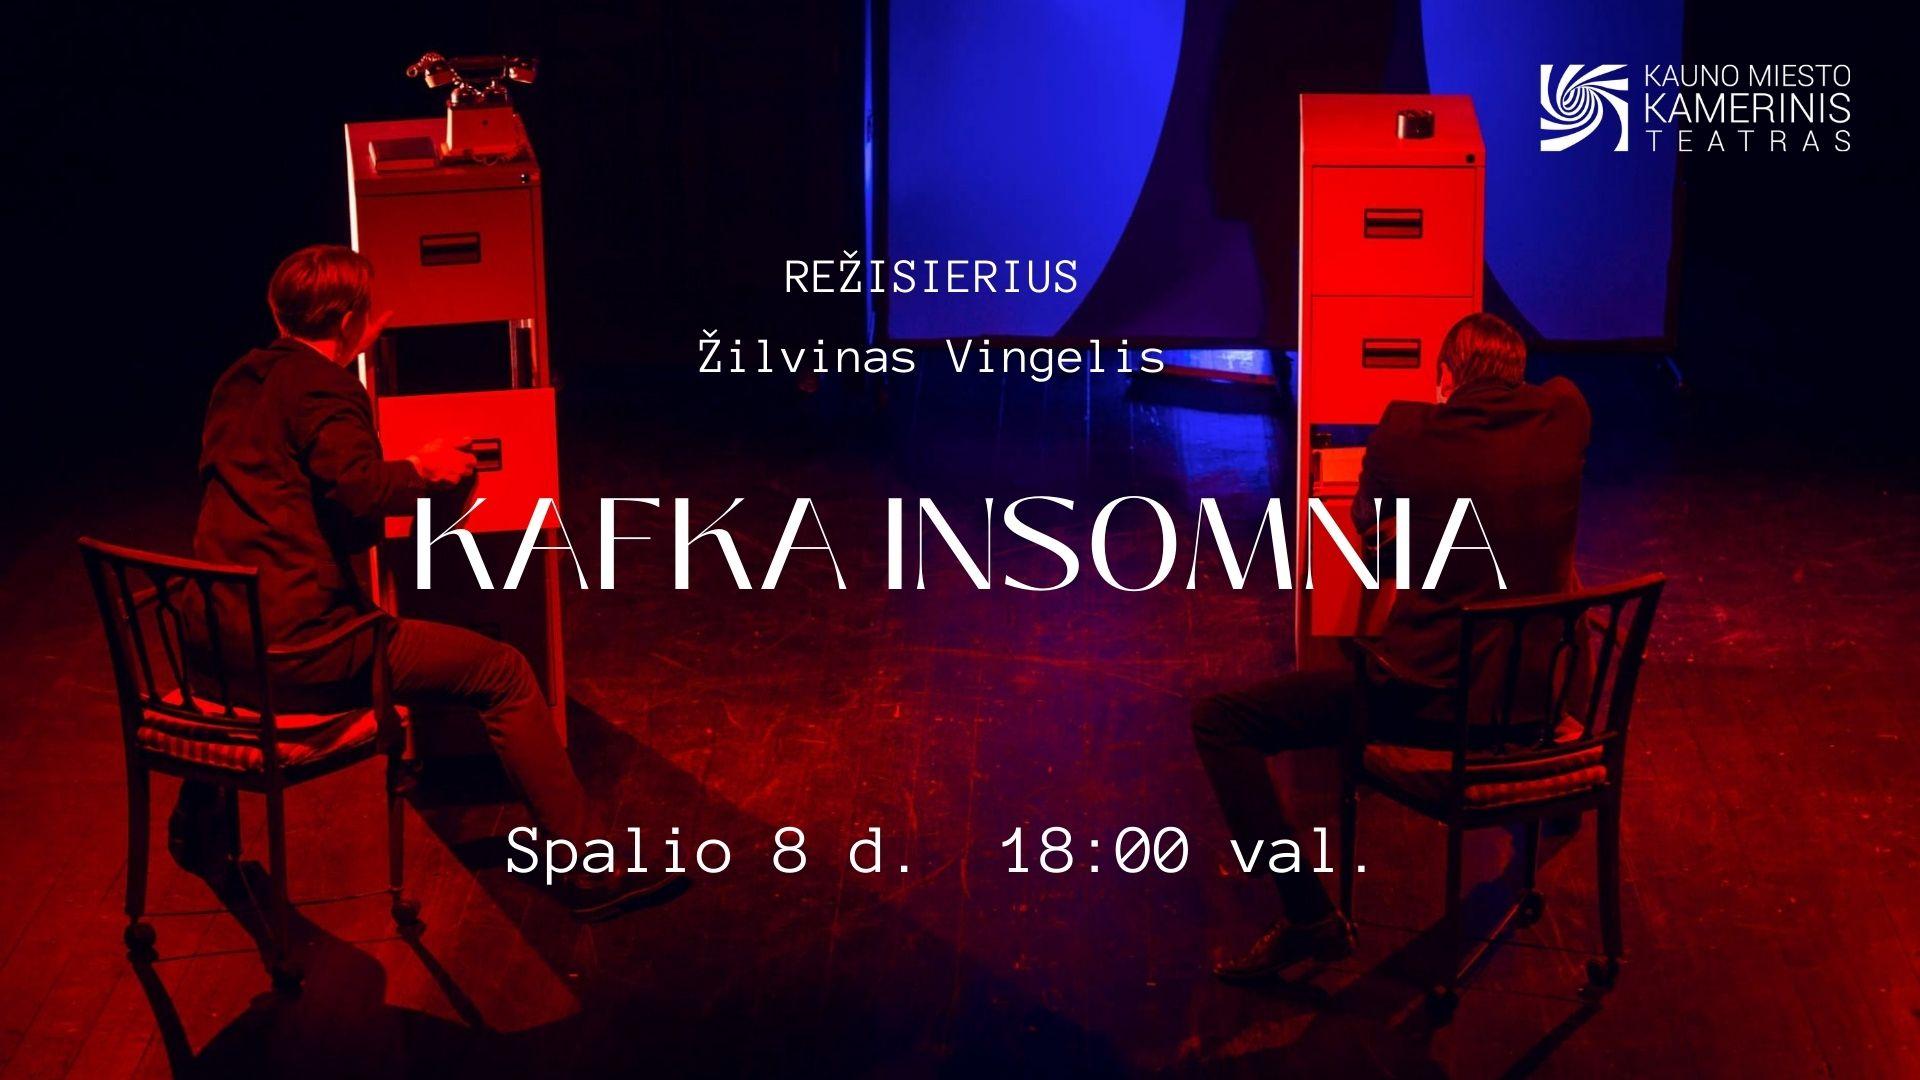 KAFKA INSOMNIA (rež. Ž. Vingelis)